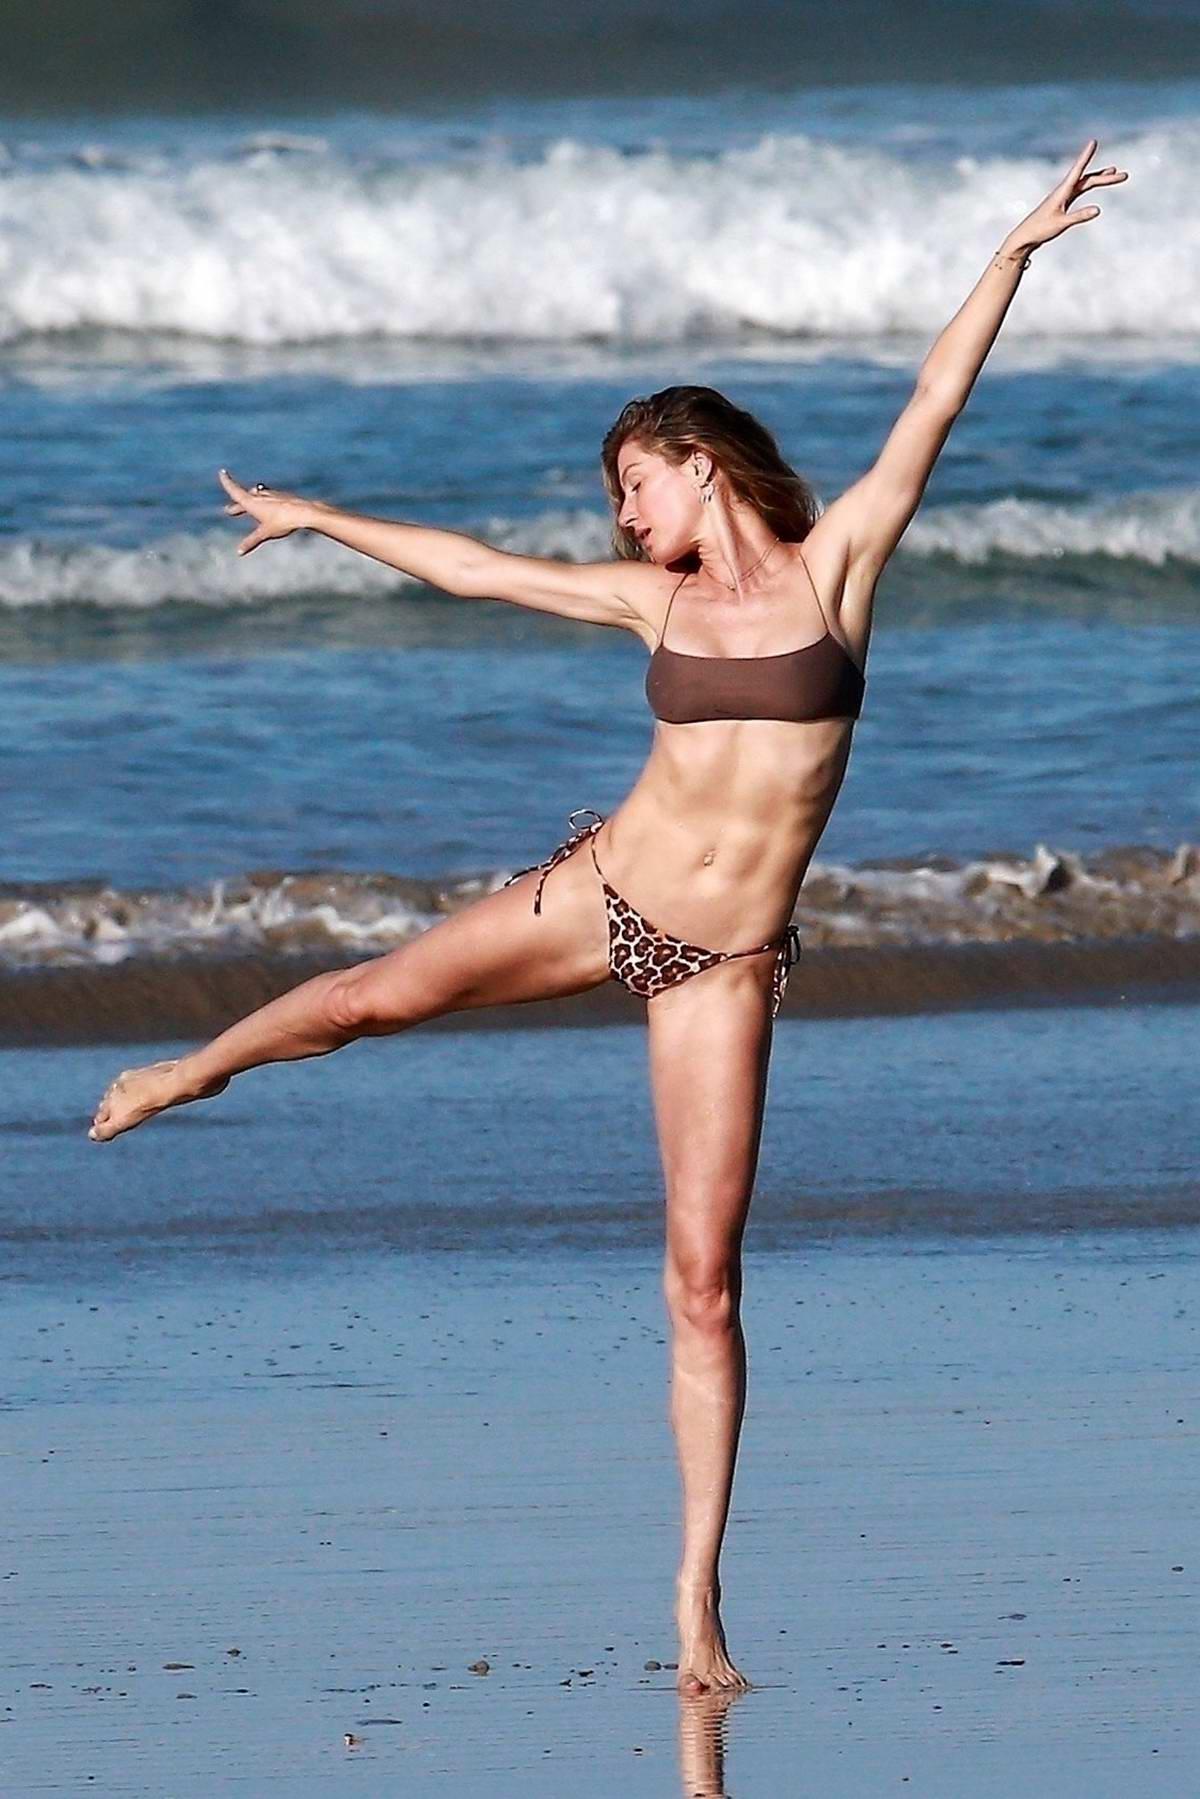 Gisele Bundchen looks incredible in a bikini during a beach photoshoot in Costa Rica